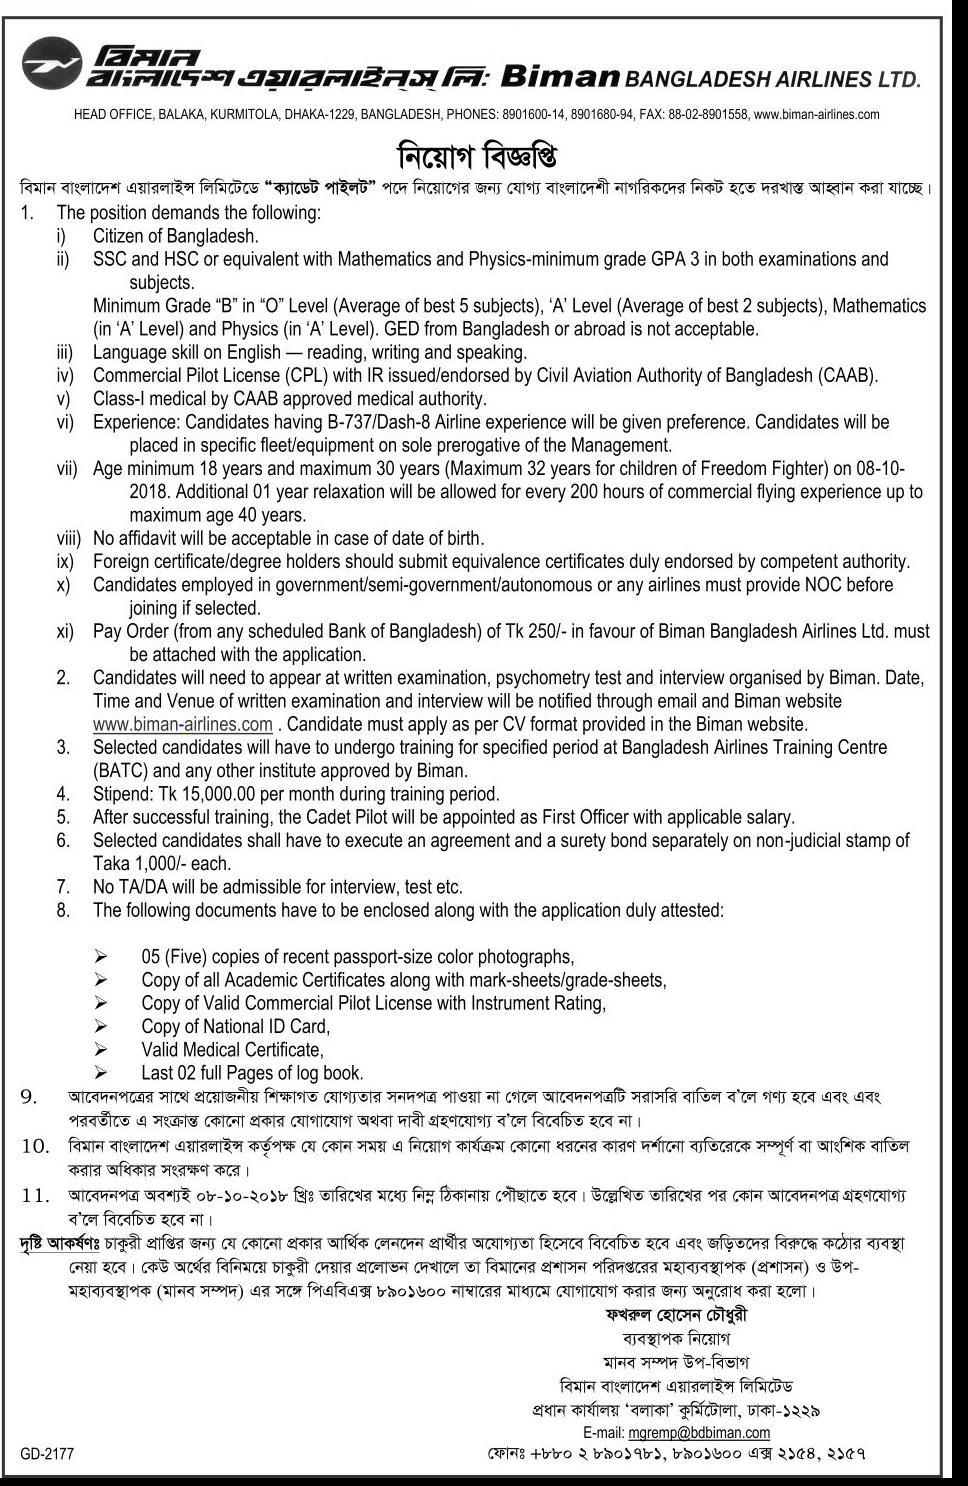 Biman Bangladesh Airlines Flight Cadet Recruitment Circular 2018